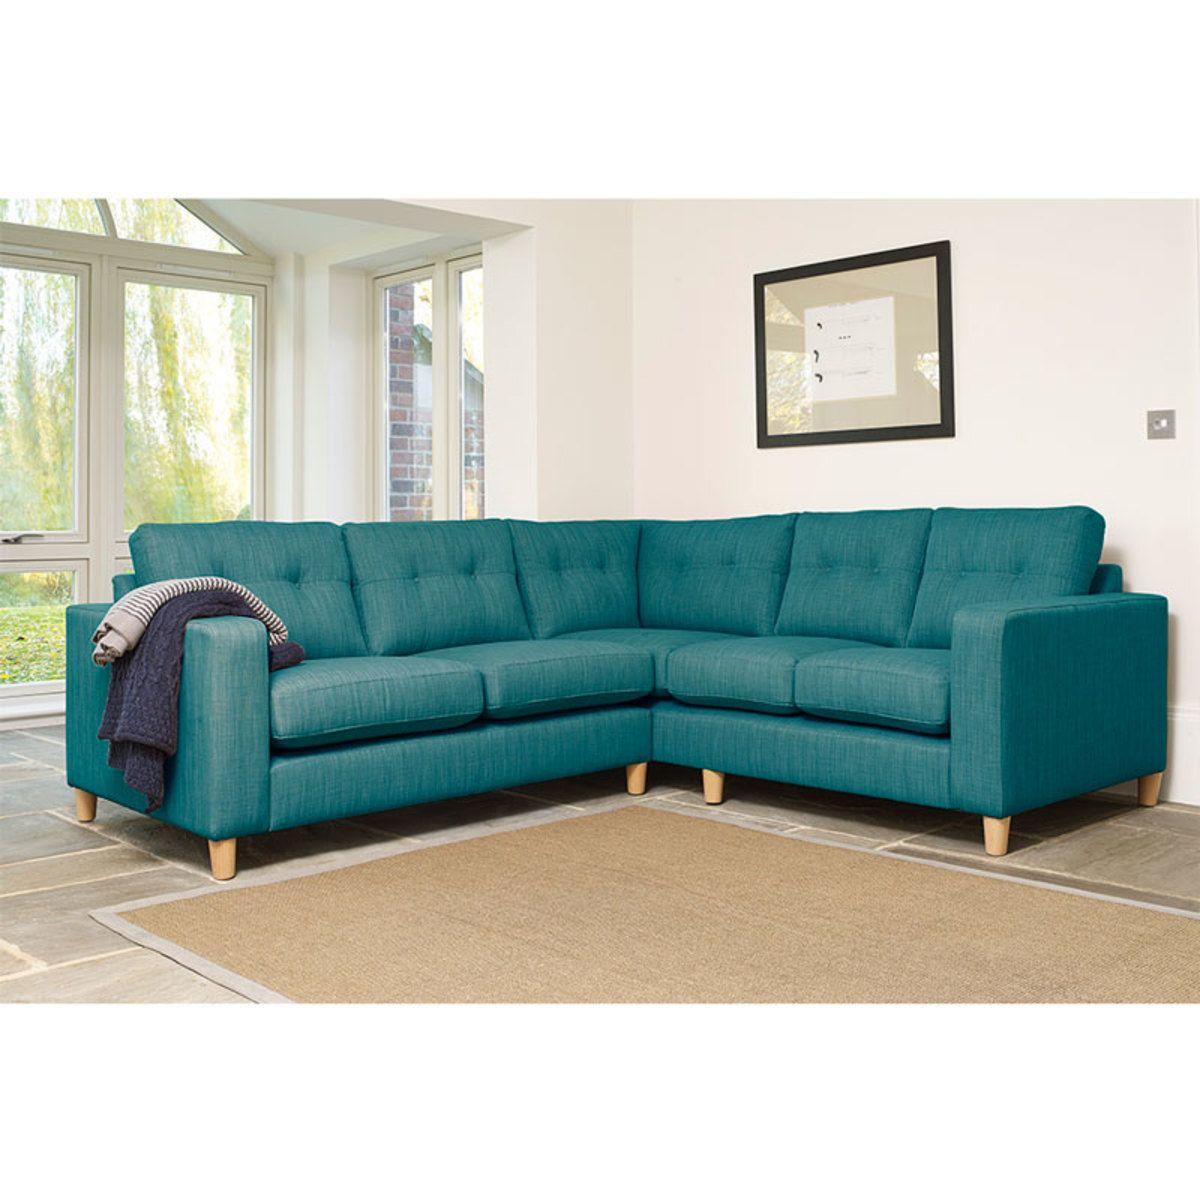 Hayden Sectional Sofa Costco Oversized Reclining Corner Nicoletti Lipari Grey Leather